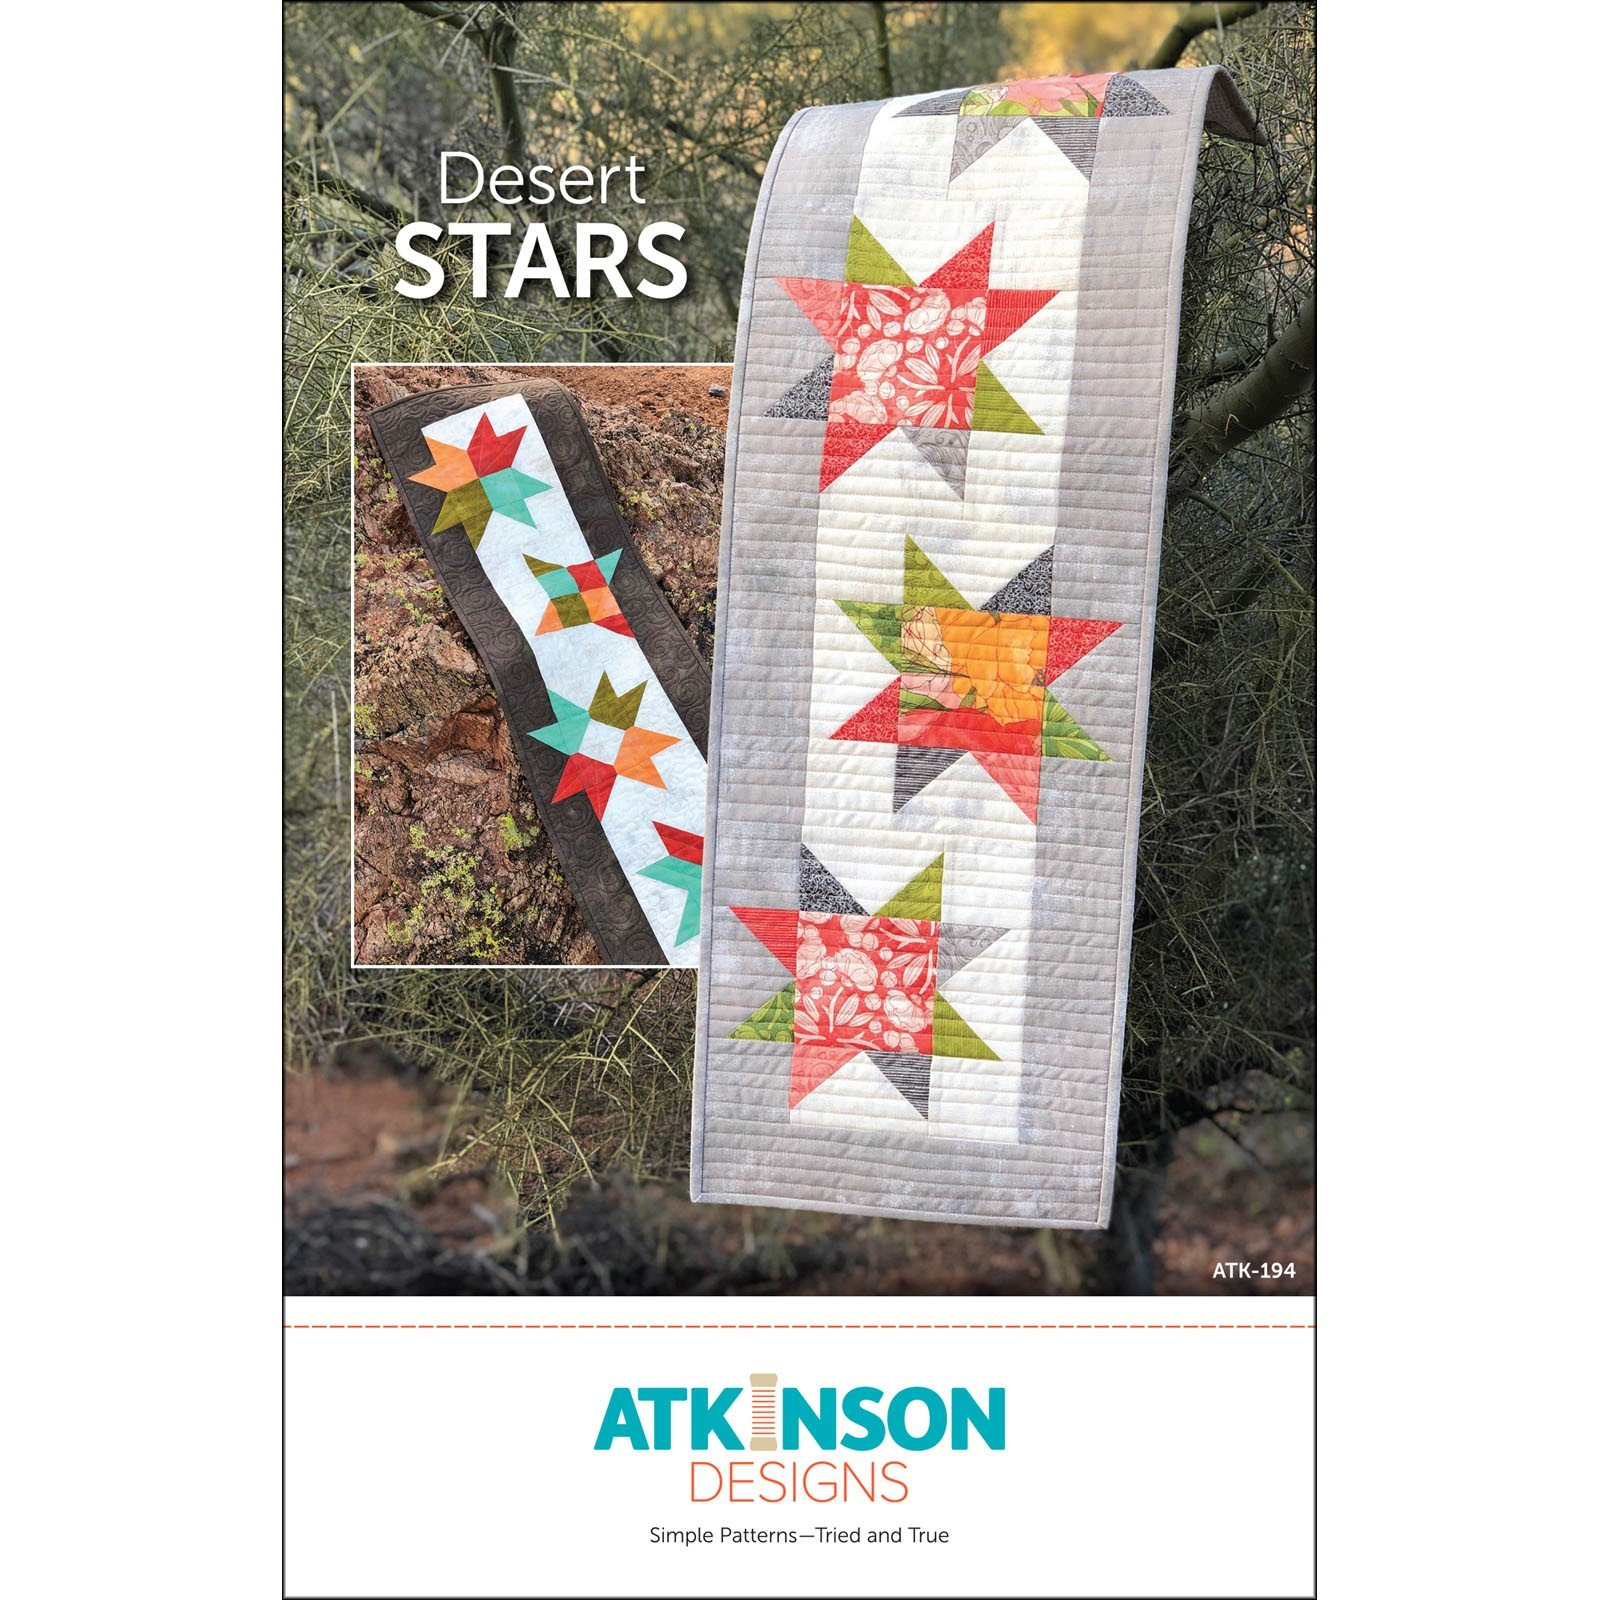 Desert Stars Table Runner<br/>Atkinson Designs ATK-194